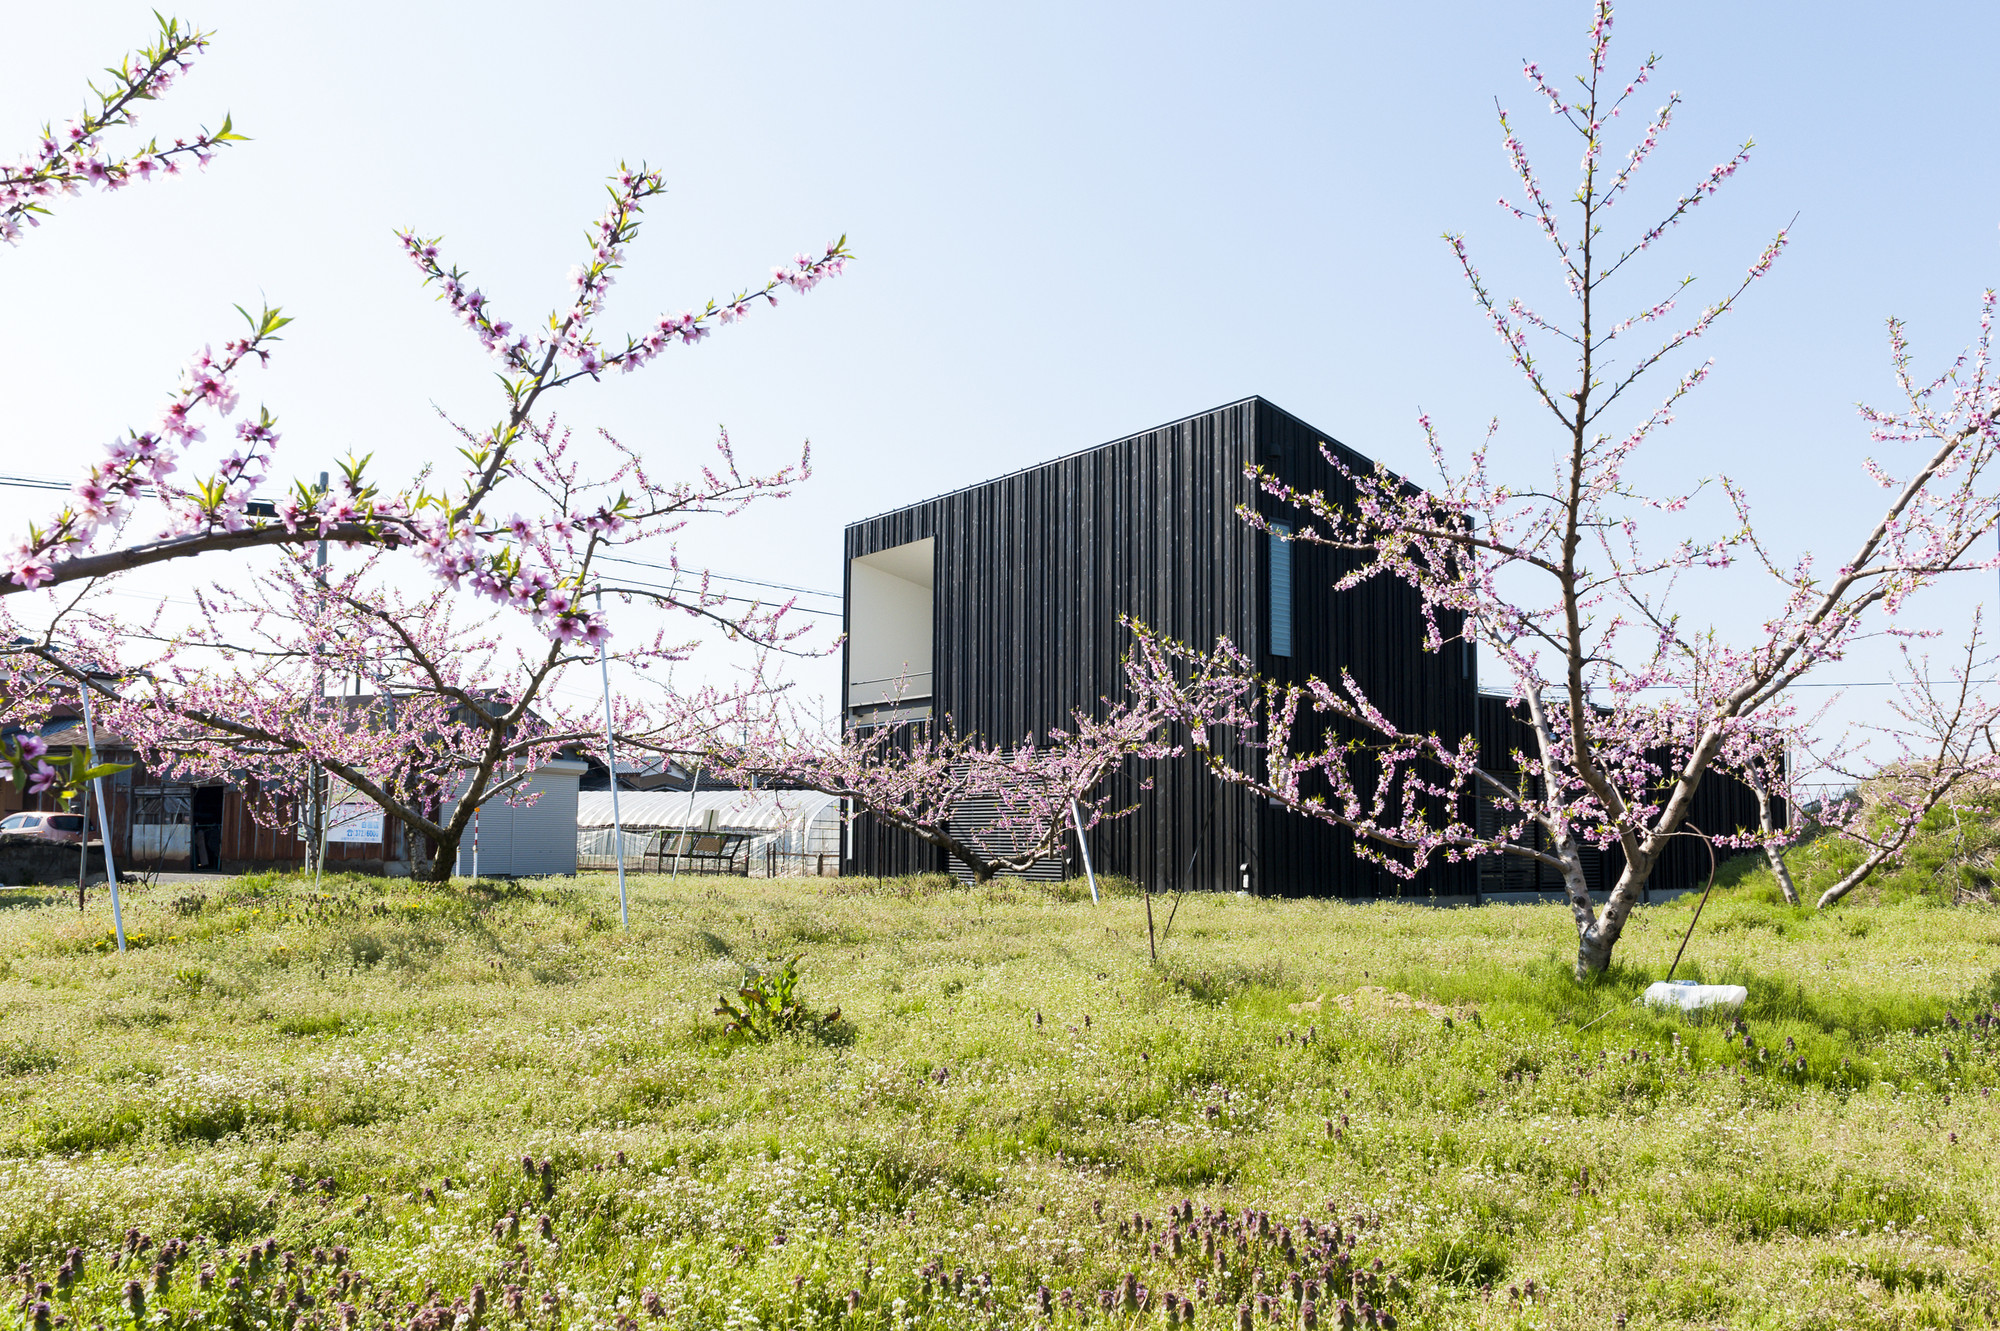 Courtyard House in Peach Garden / Takeru Shoji Architects, © Murai Isamu